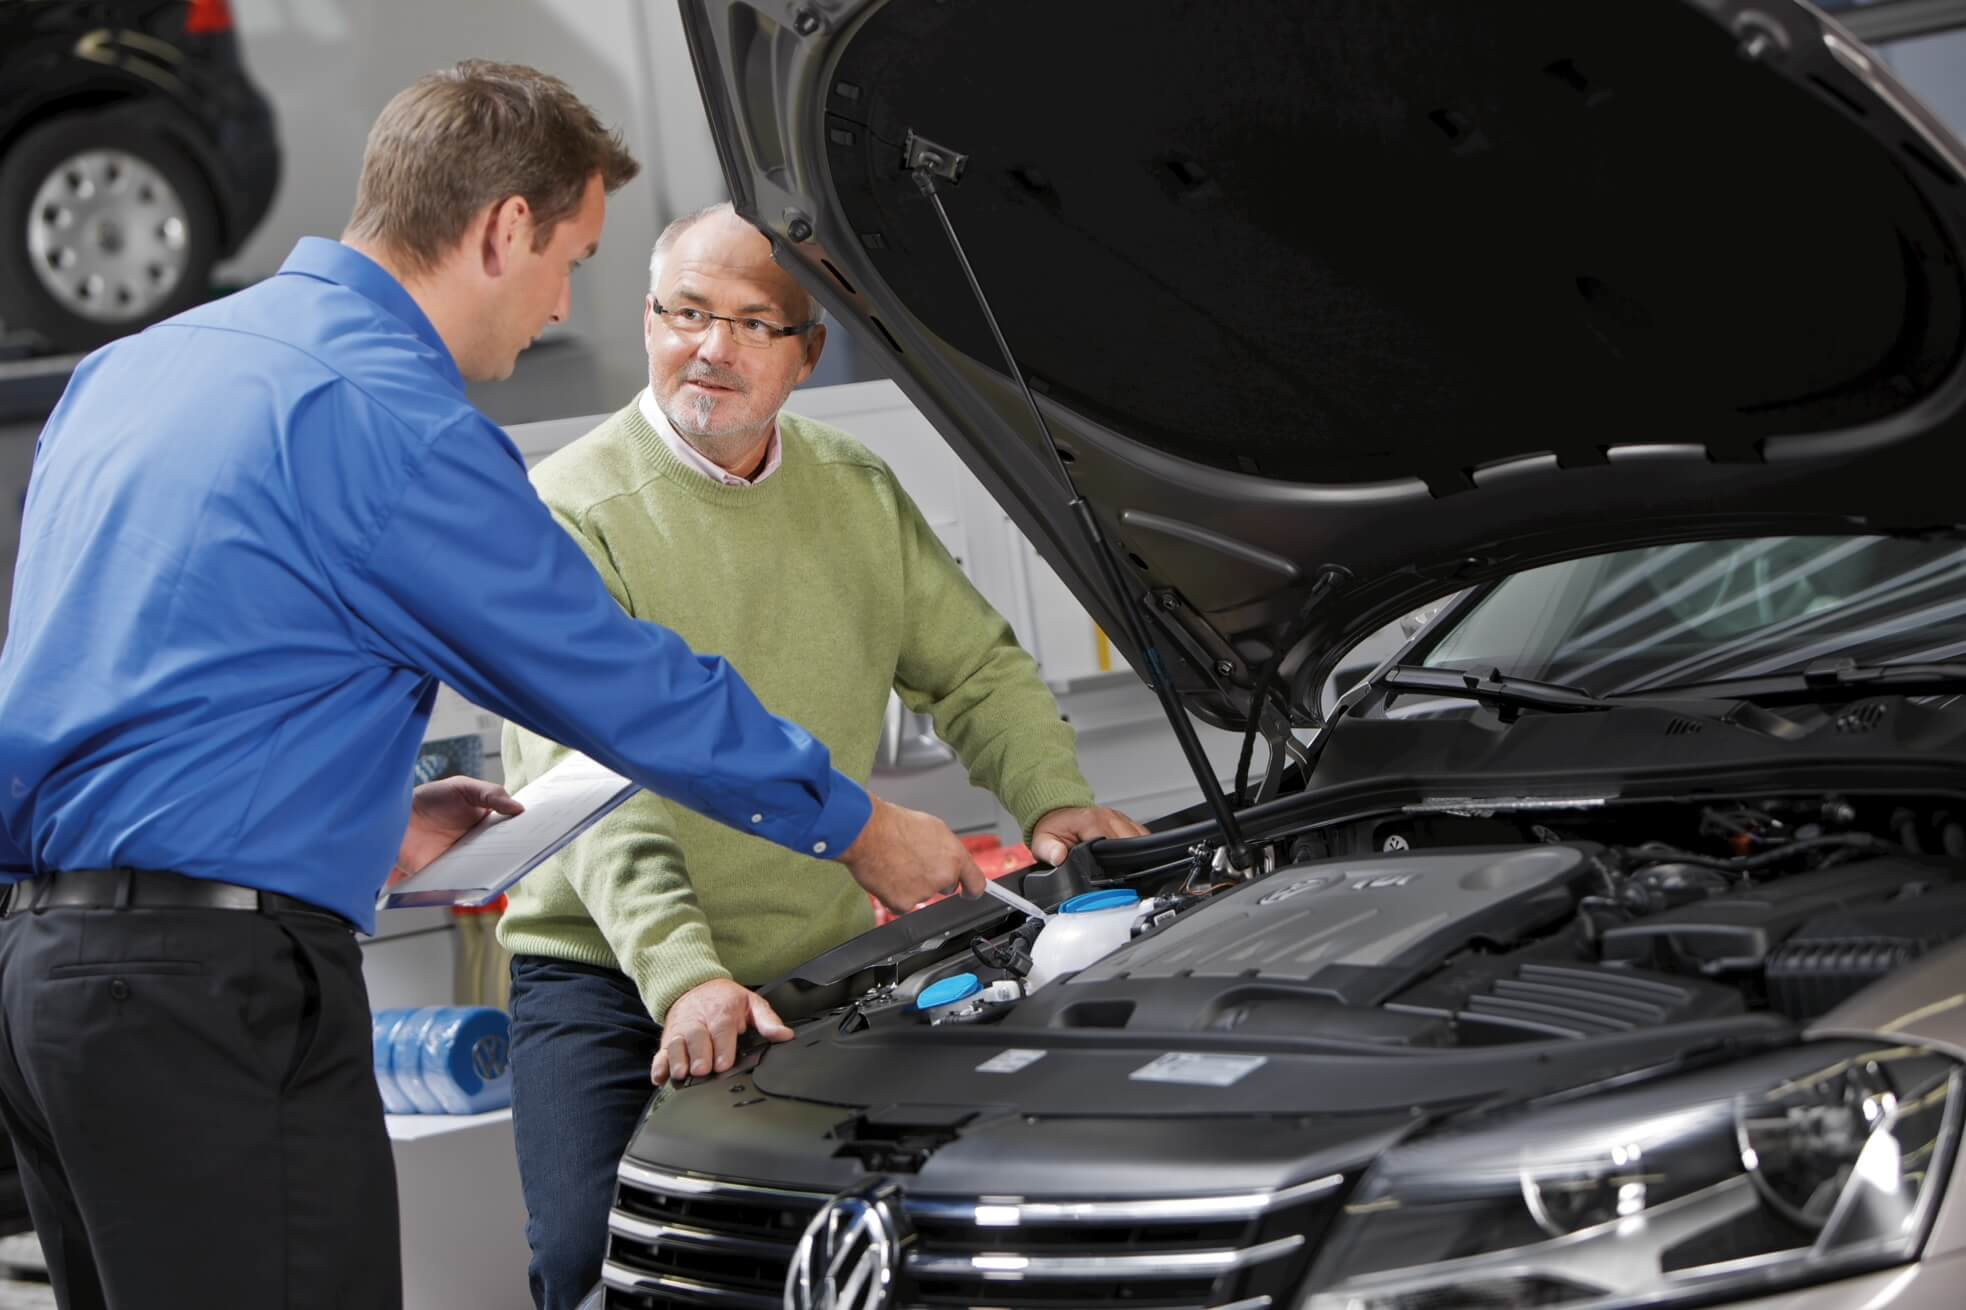 Volkswagen Maintenance & Repair